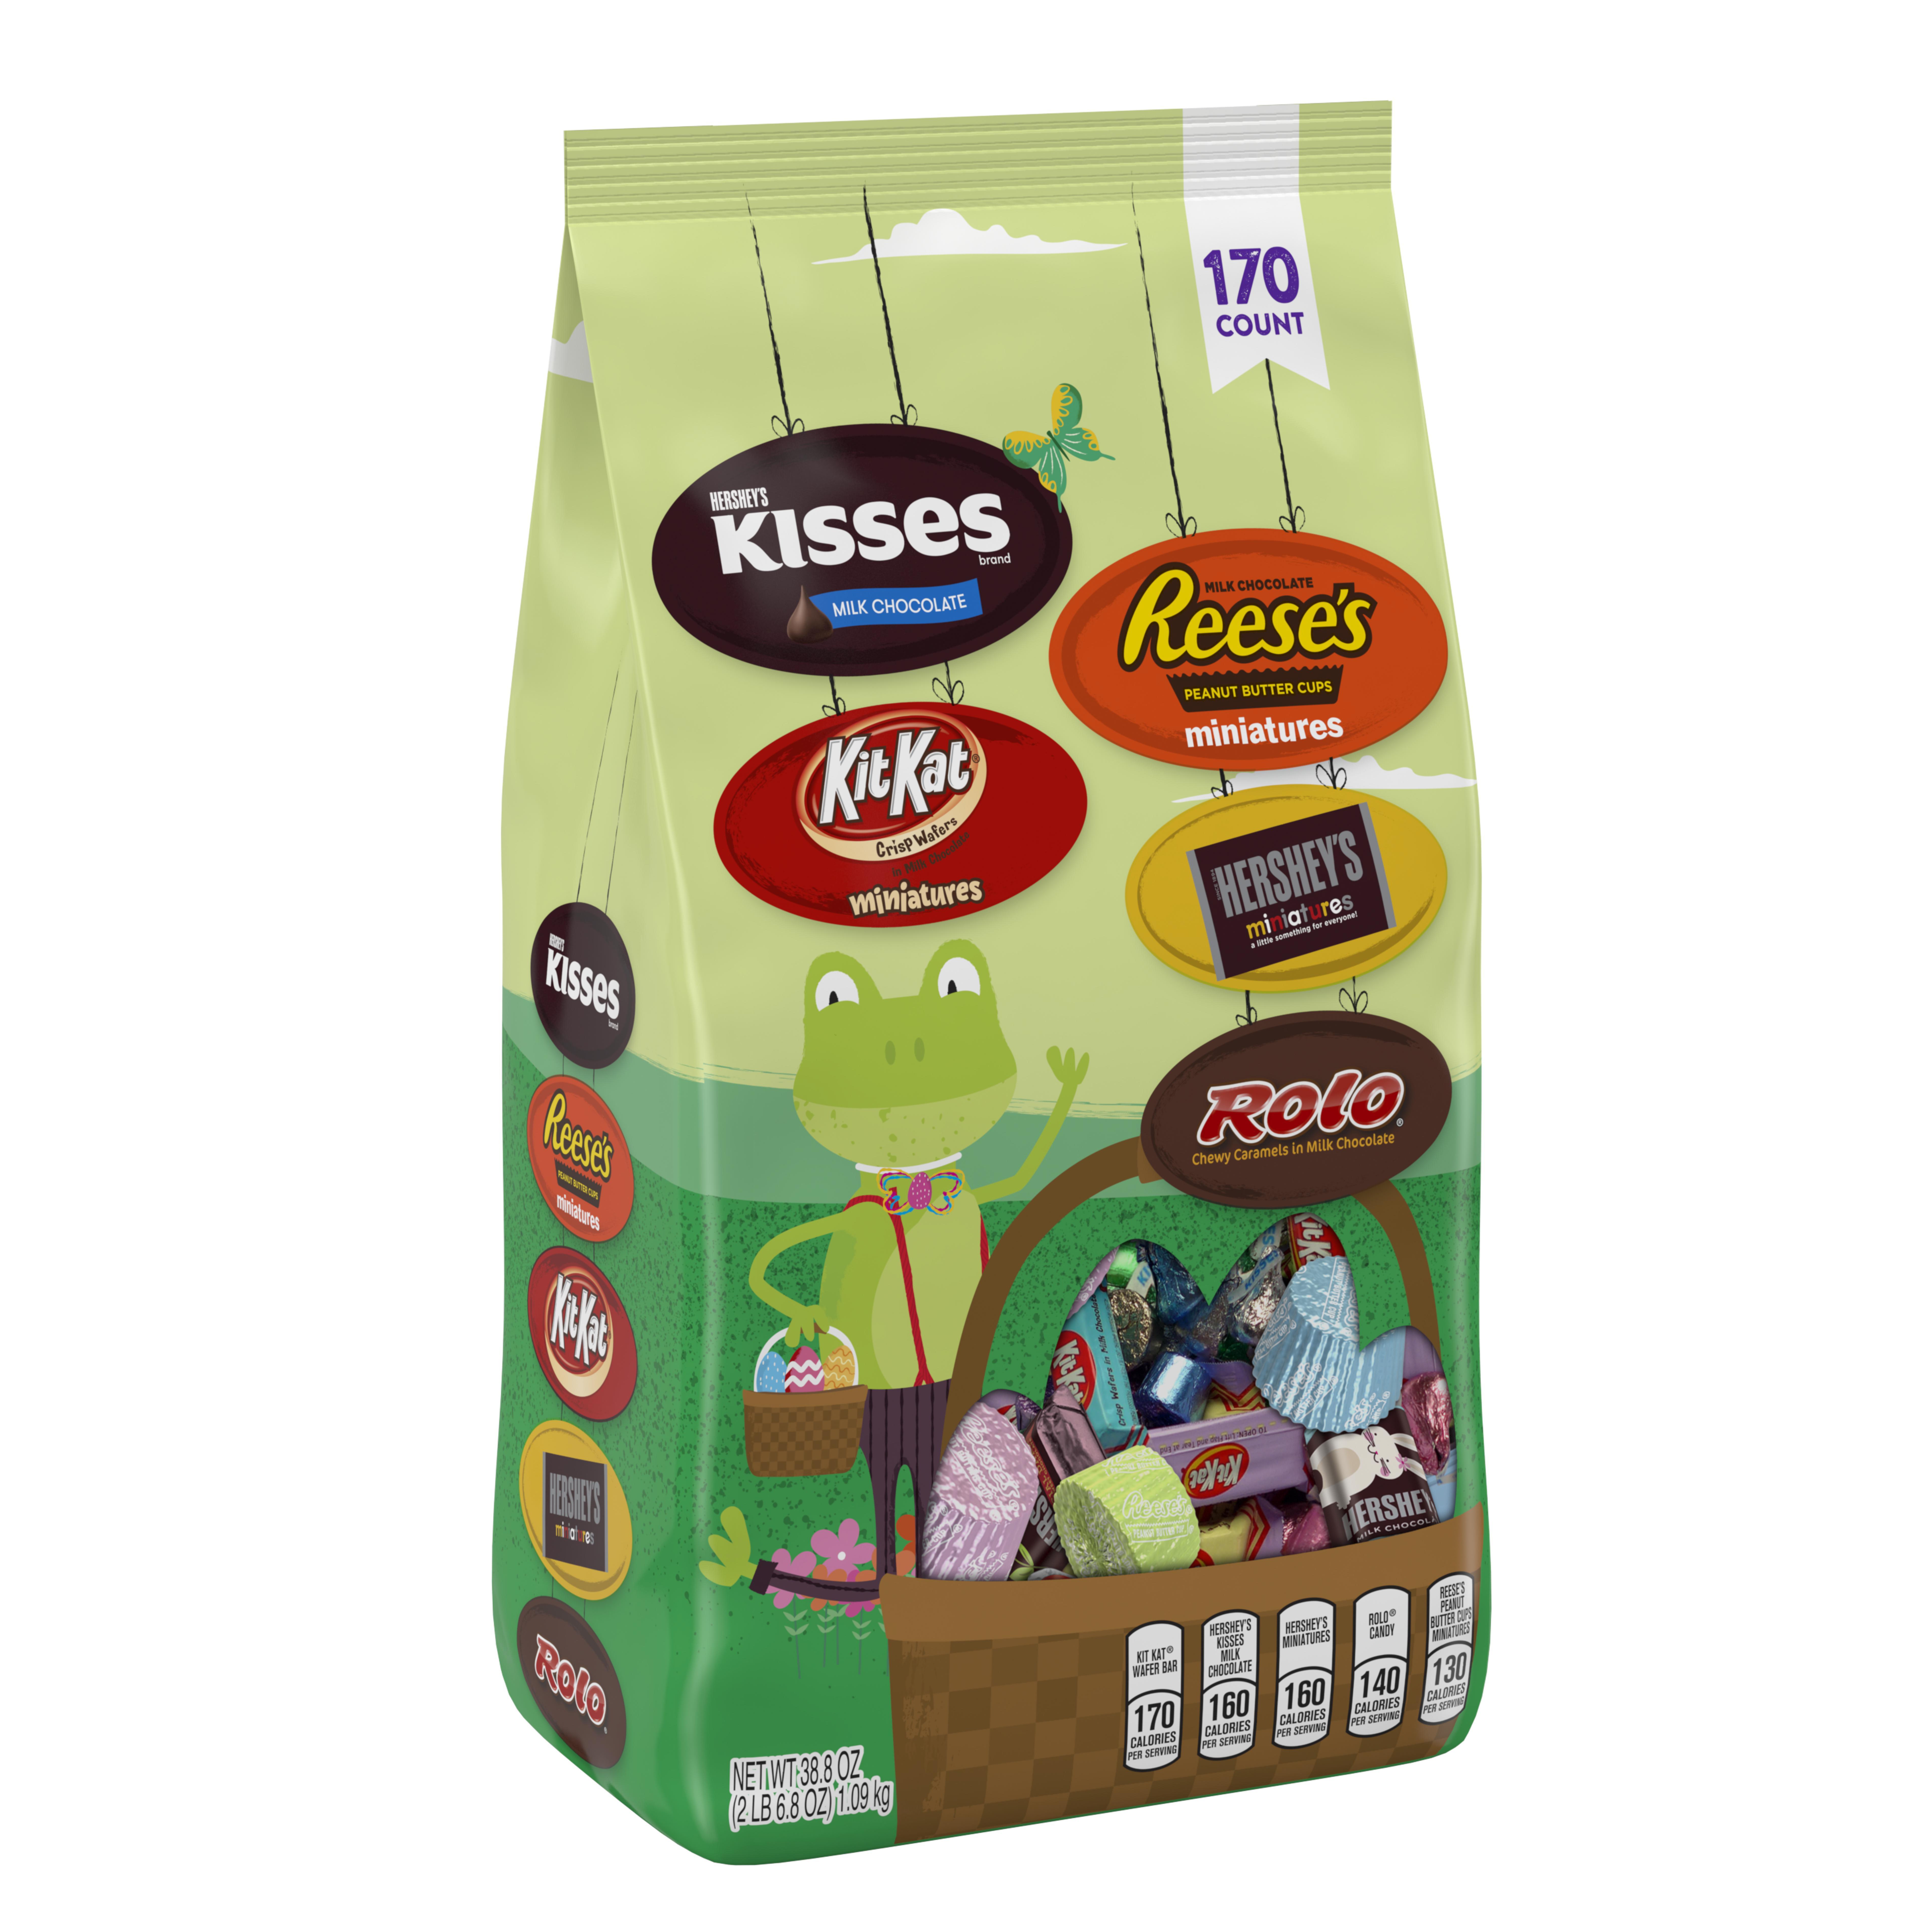 Hershey's Easter Egg Hunt Assortment, 170 Count